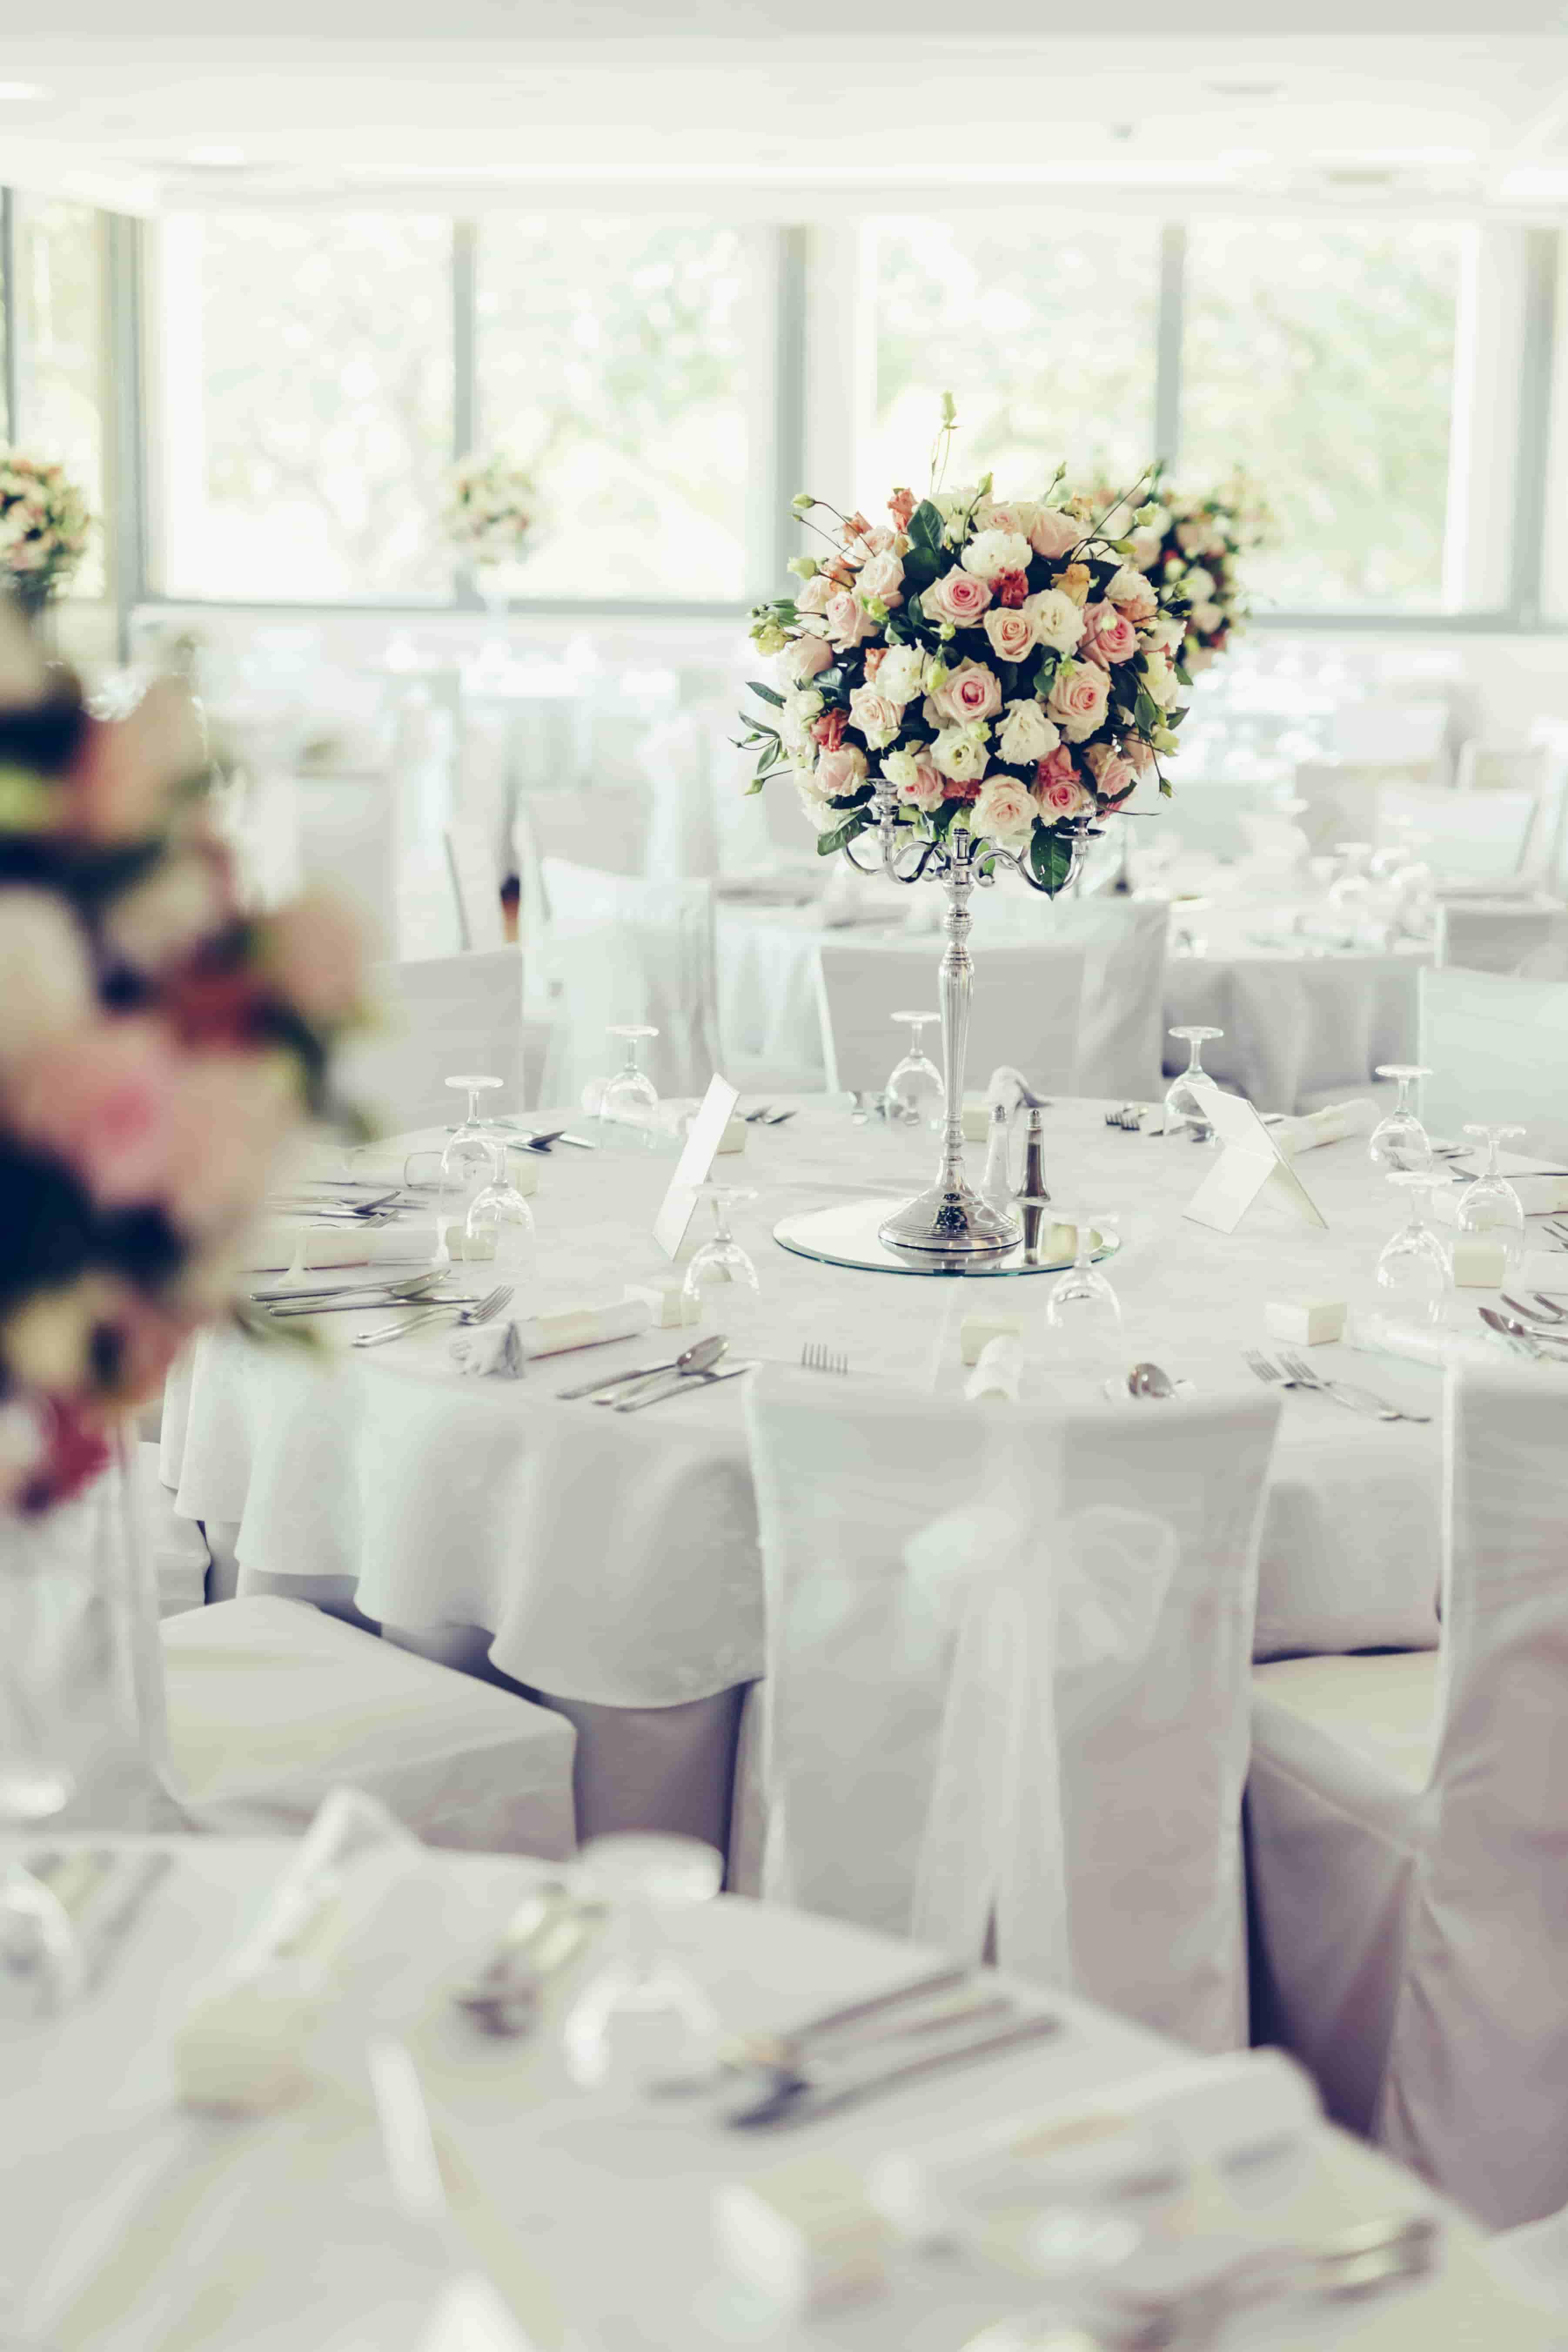 Beautiful wedding rose image